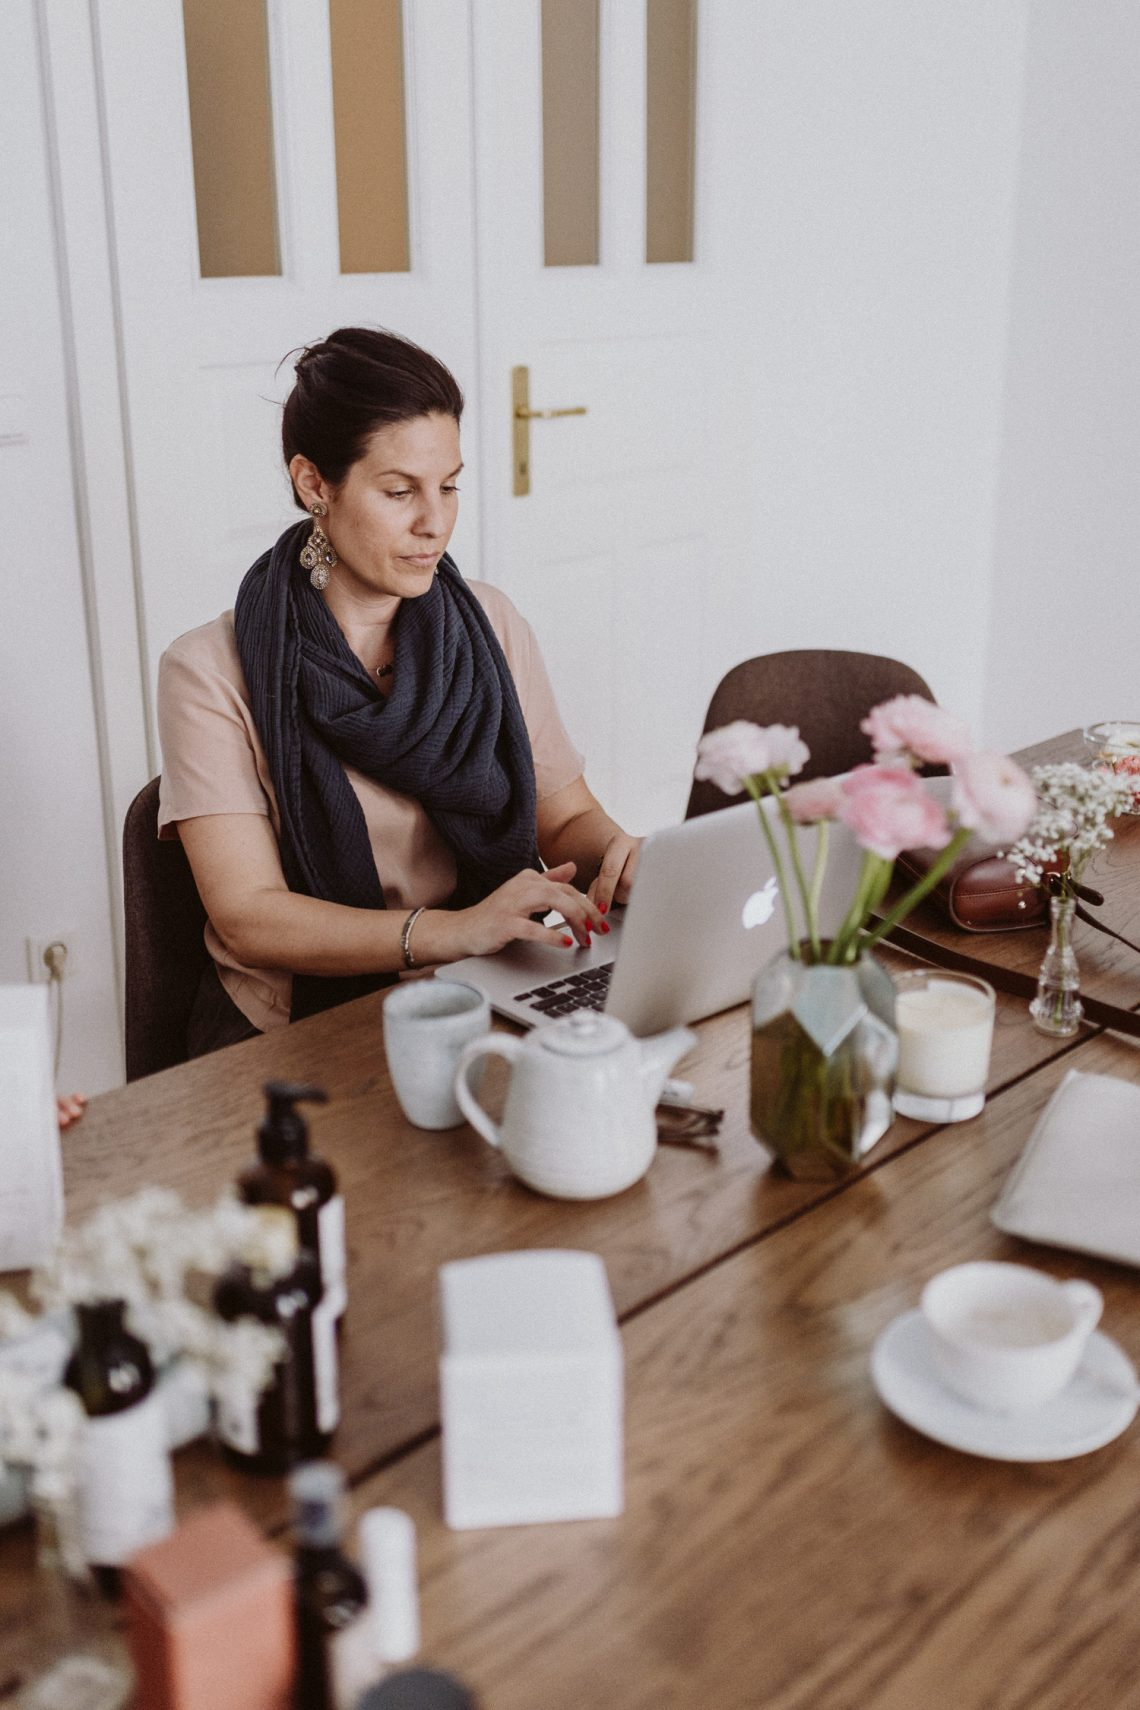 Job Report: Isabel Zinnagl, Gründerin von ALMA Babycare